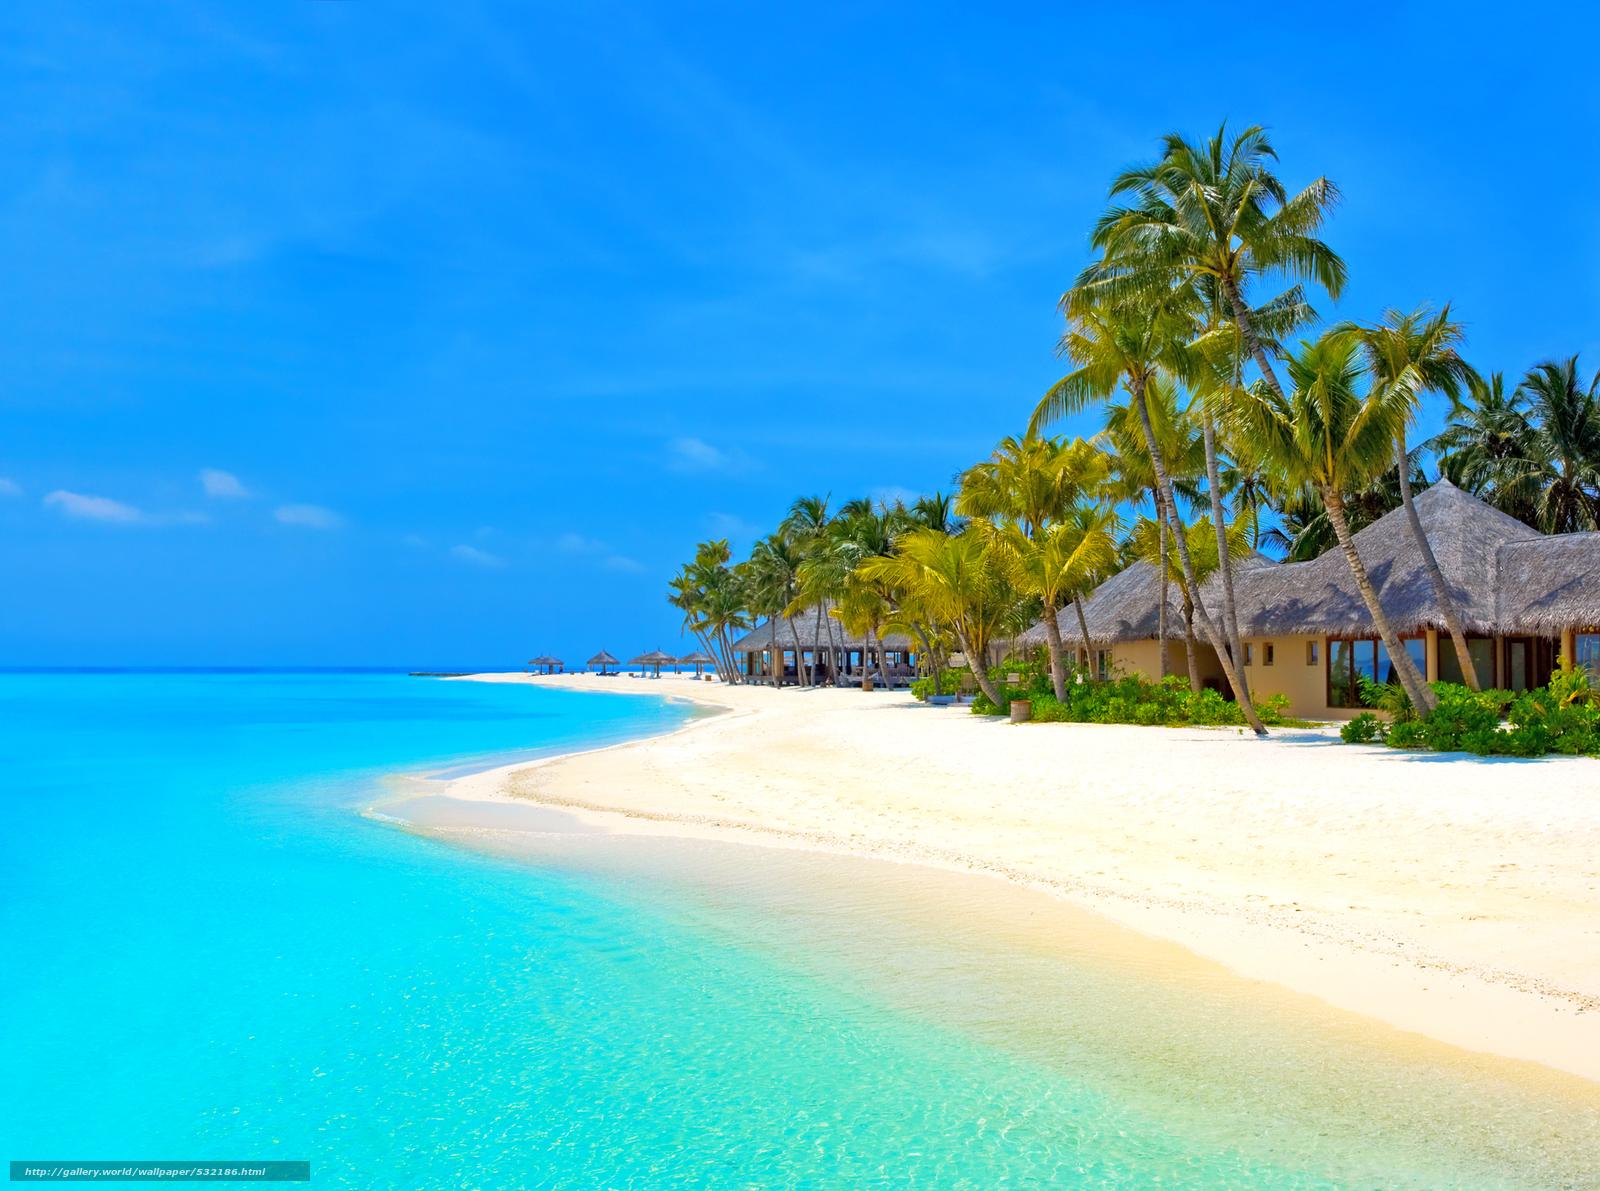 Baixar wallpaper praia bangal tropical ilha papis de for Sfondi spiagge hd